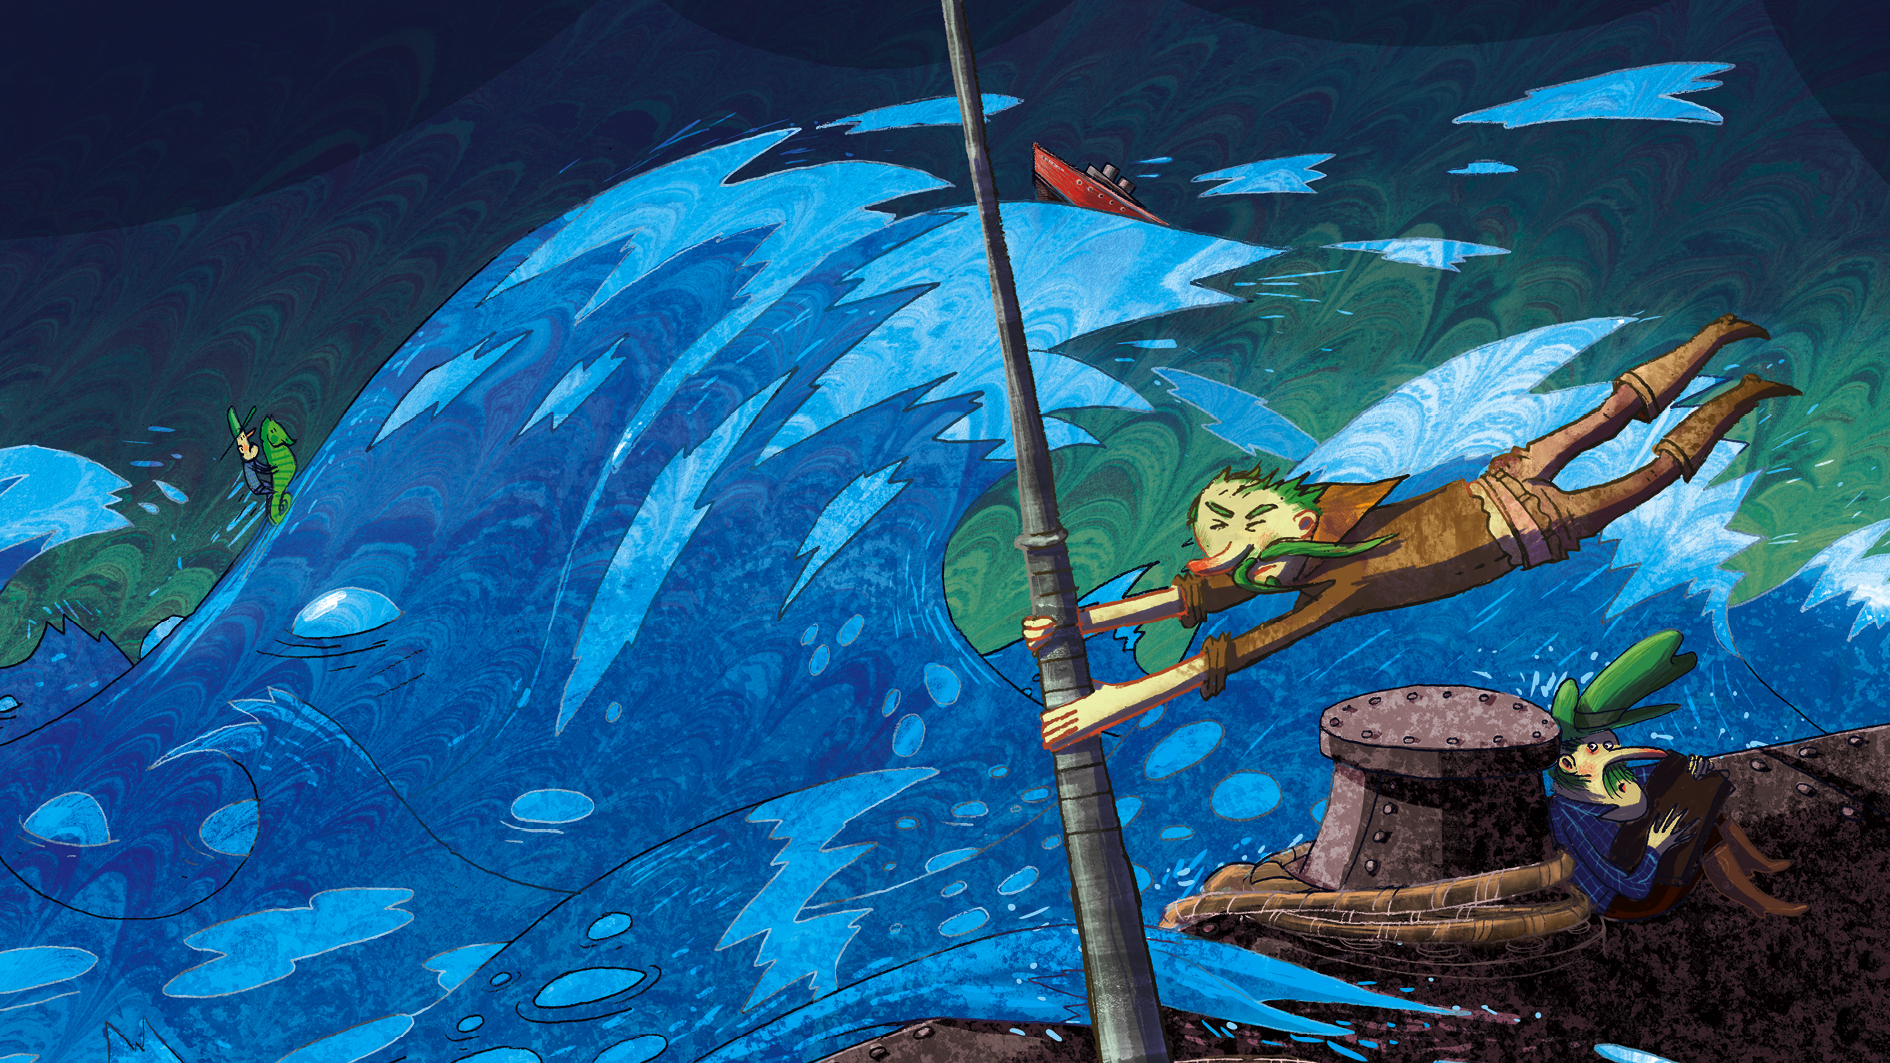 Geckos bunte Geschichtenwelt, Headerbild